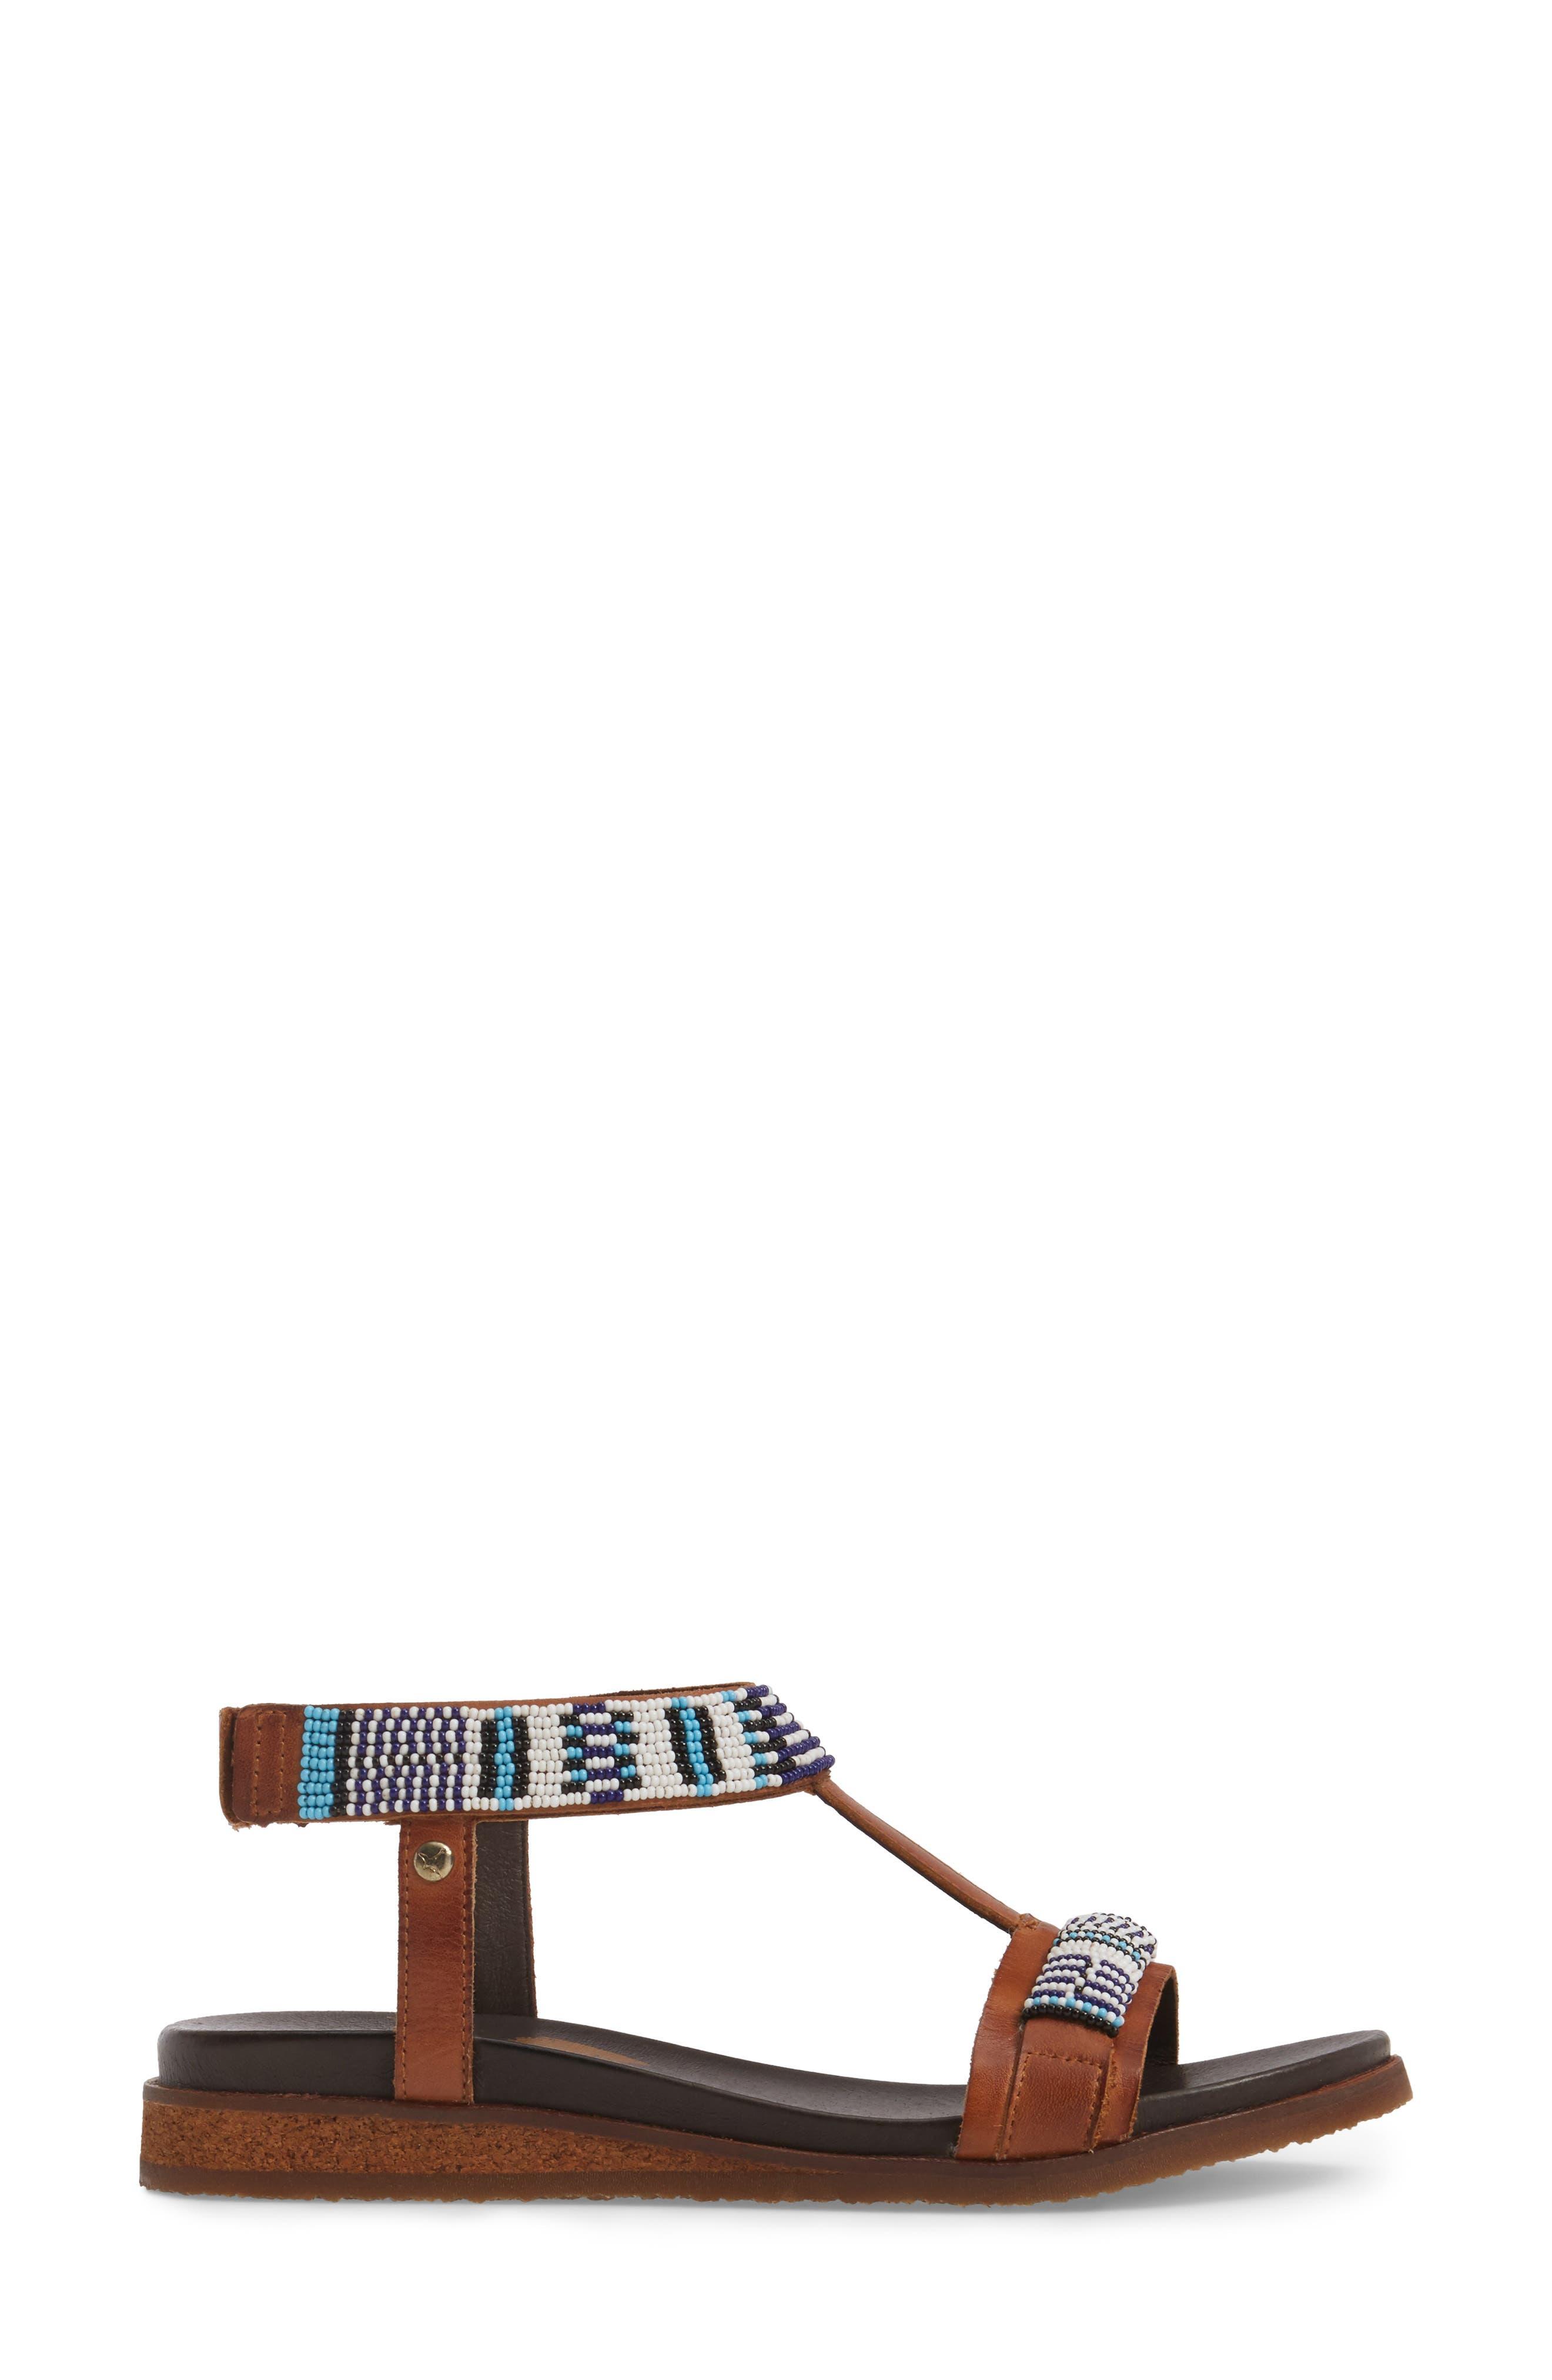 Antillas Beaded Sandal,                             Alternate thumbnail 3, color,                             Brandy Leather